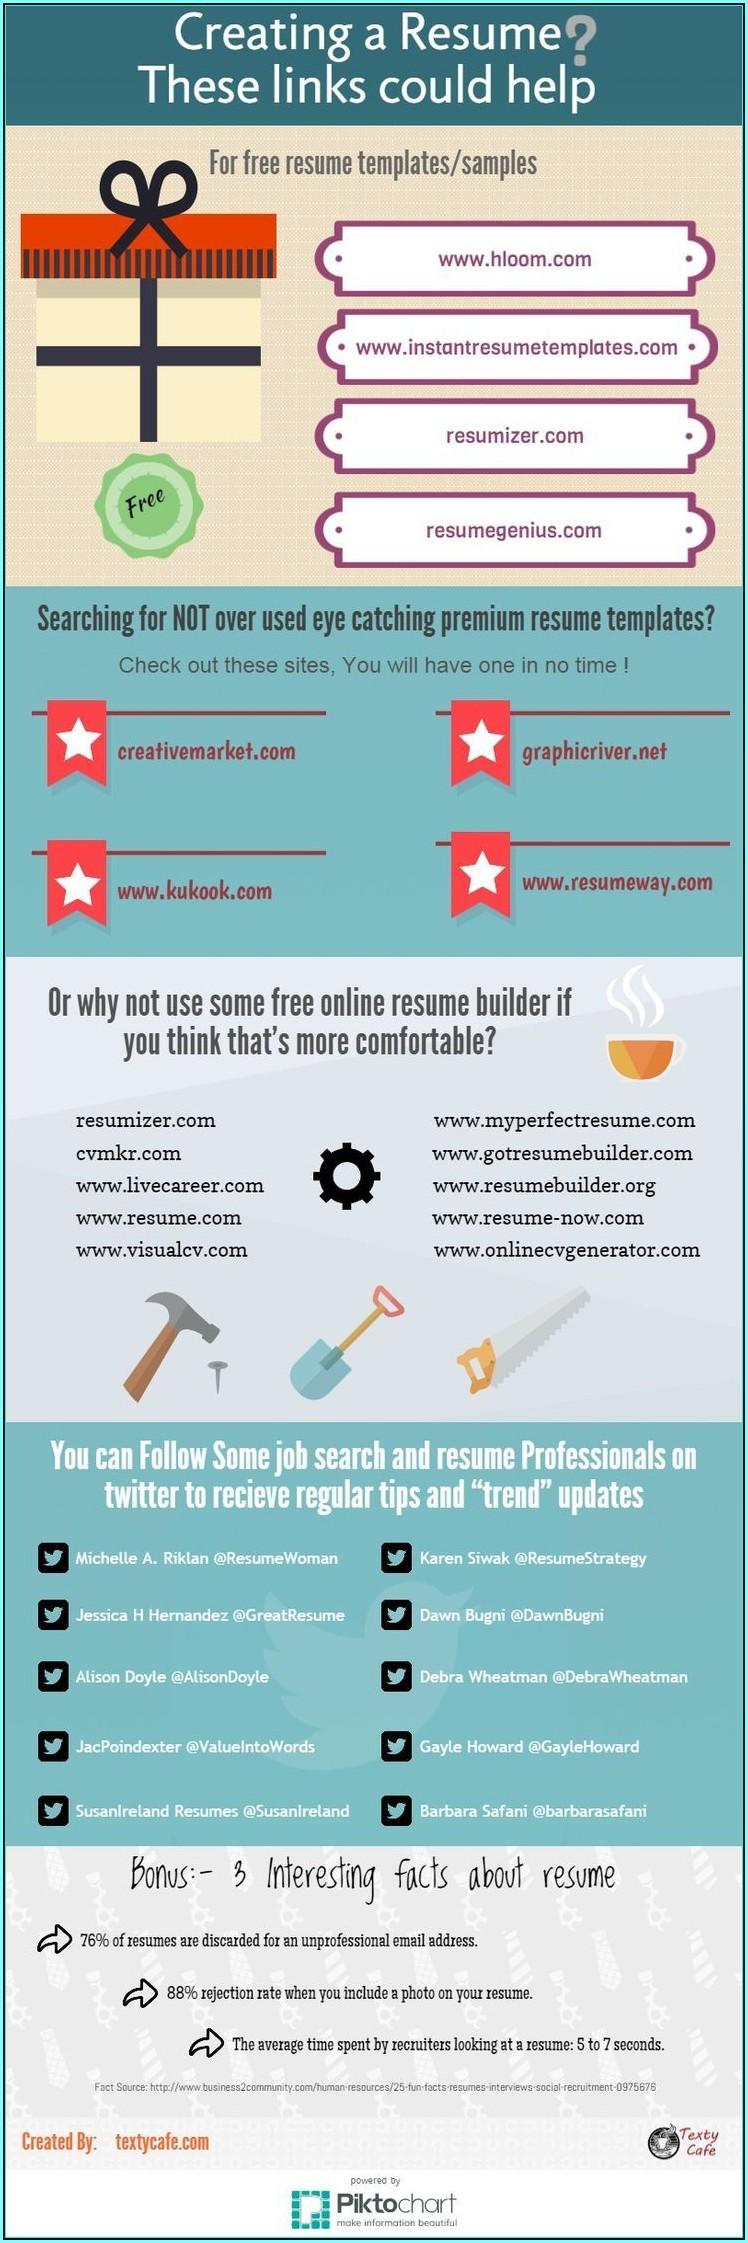 Professional Resume Services In Orlando Florida